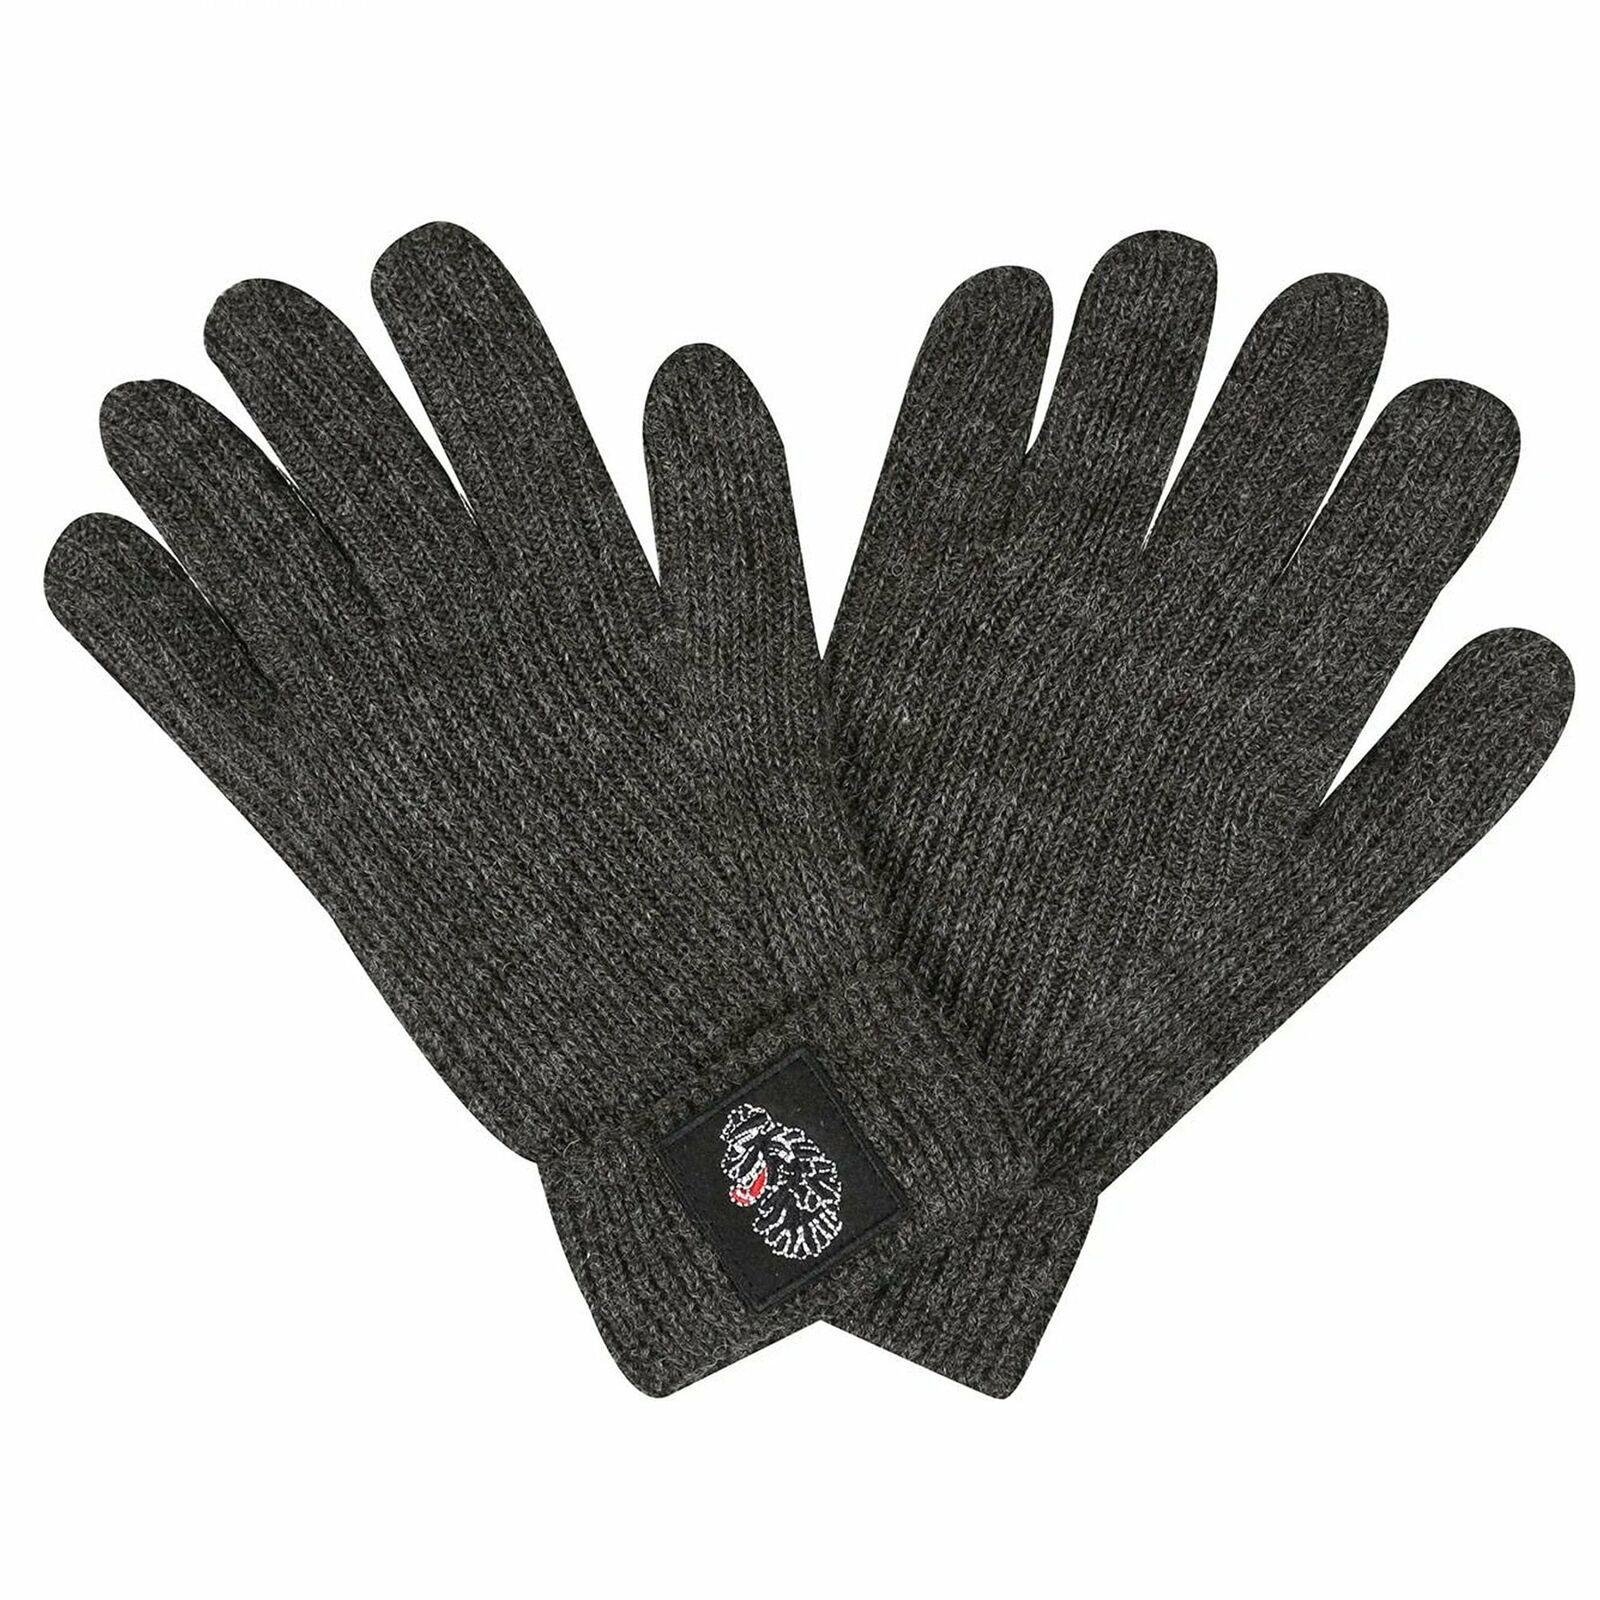 Luke 1977 Milo Knitted Logo Charcoal Grey Gloves M621203